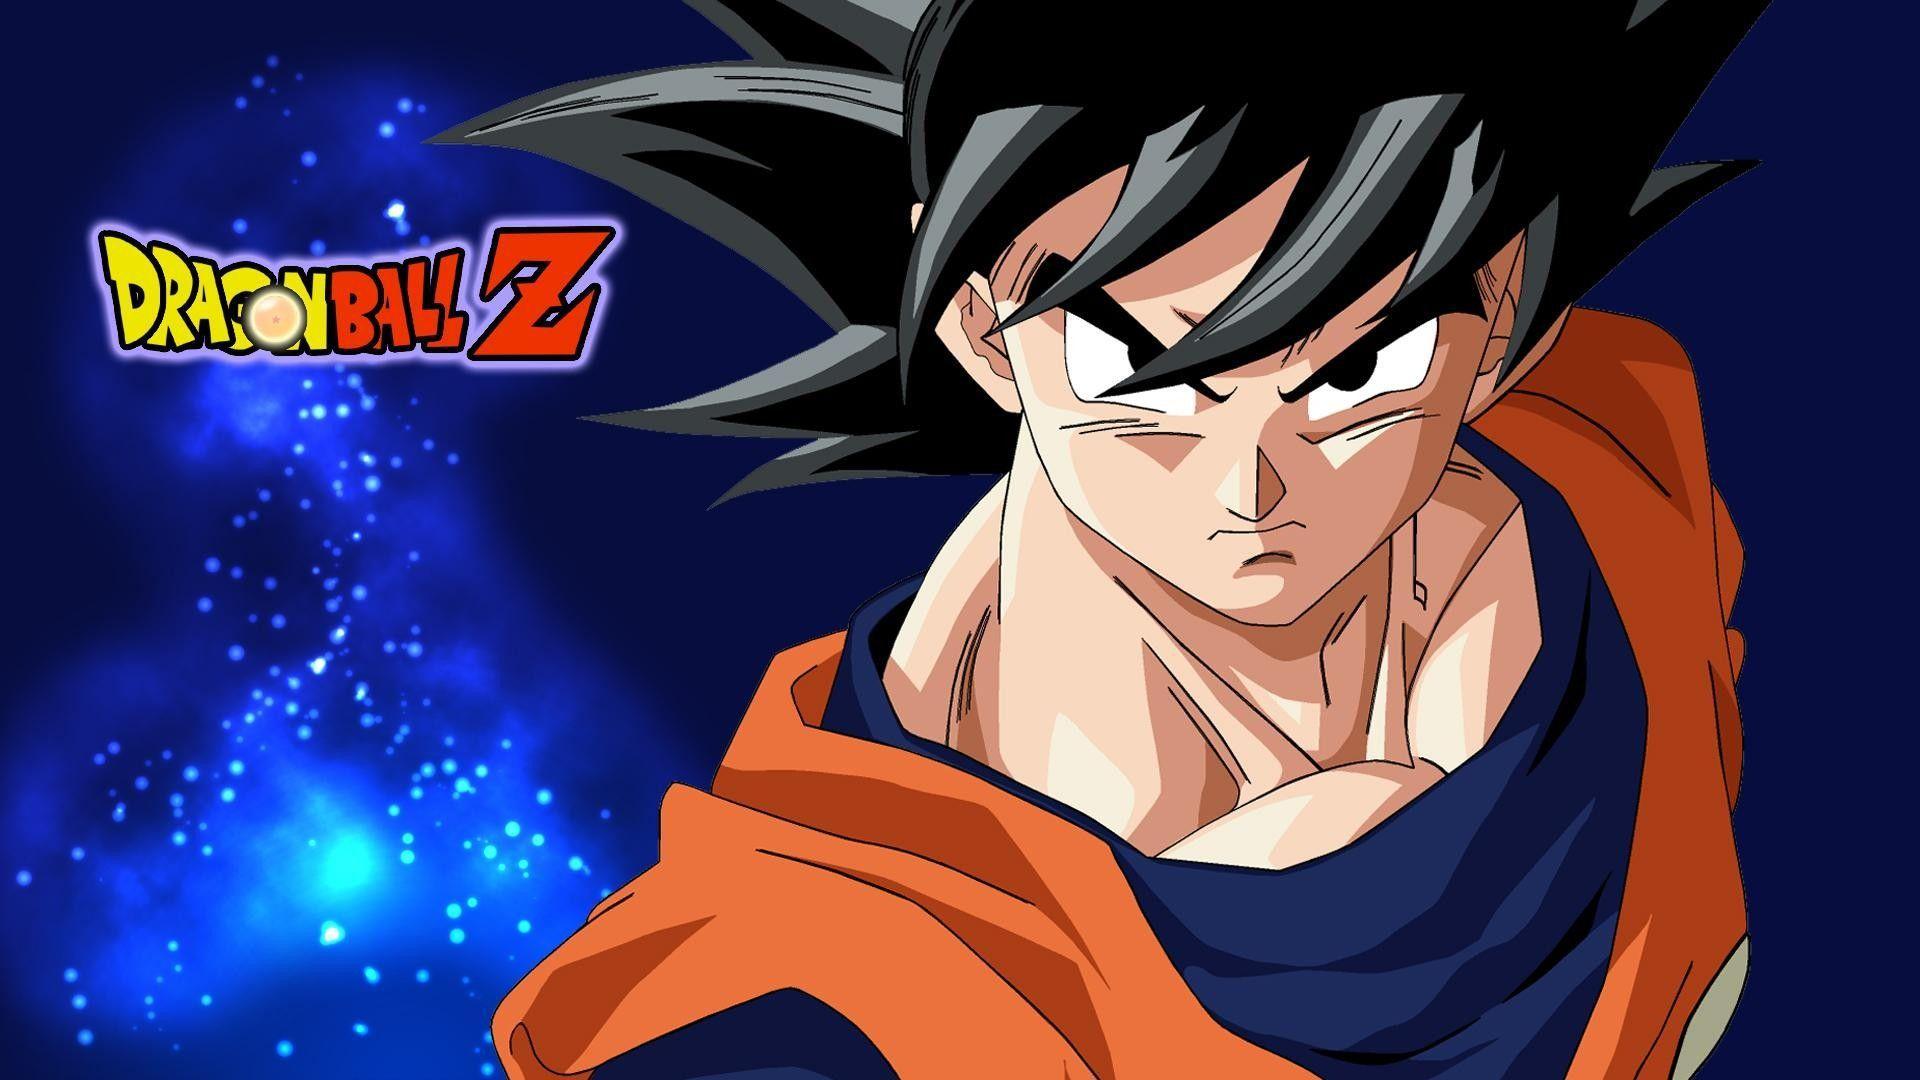 Dragon Ball Z Goku Wallpapers Top Free Dragon Ball Z Goku Backgrounds Wallpaperaccess